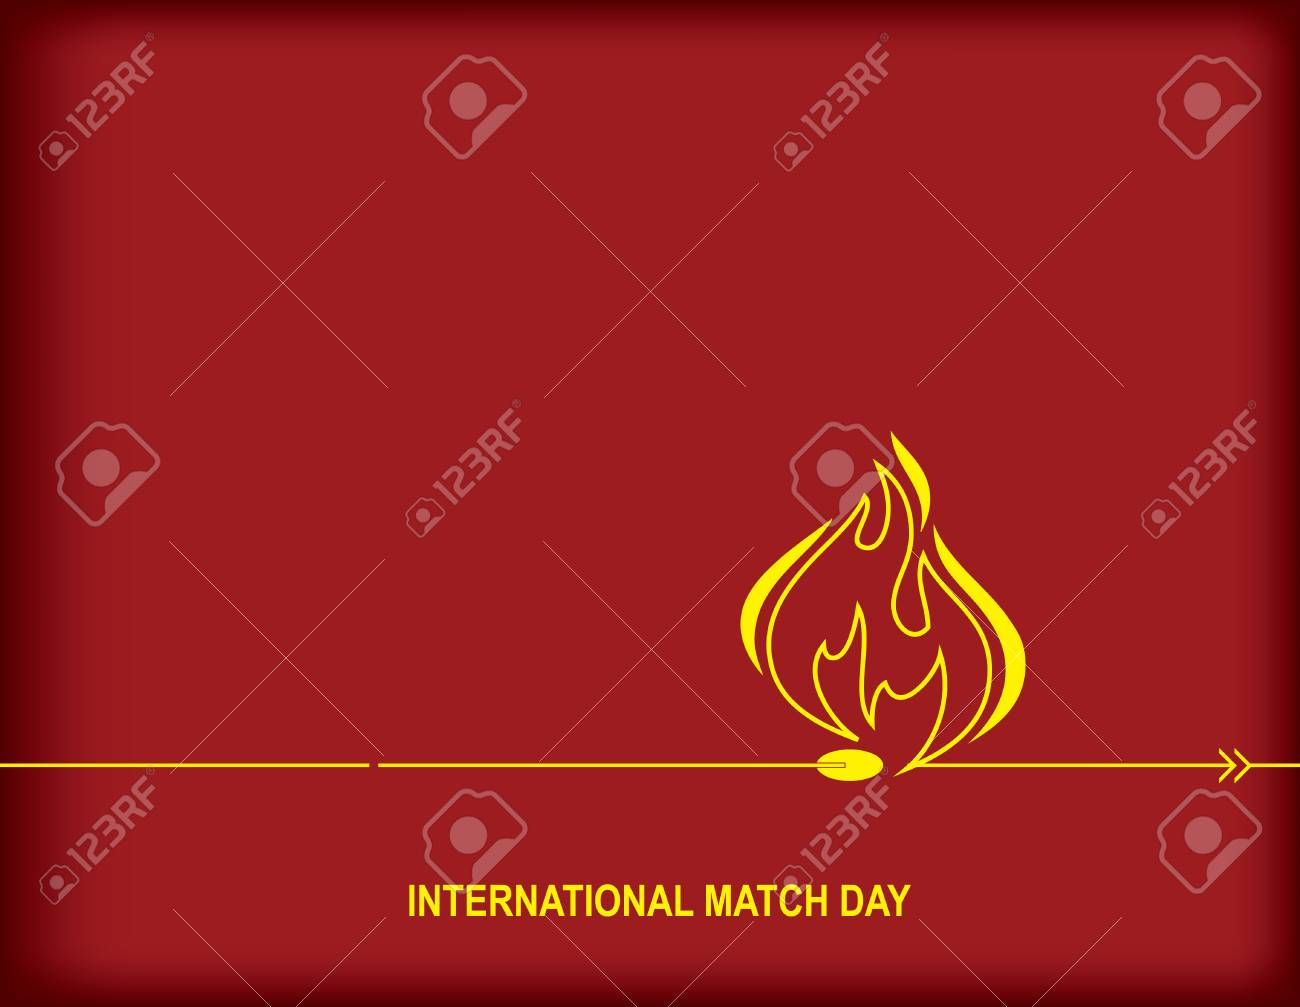 International Match Day Calendar Holiday On March 2 Royalty Free